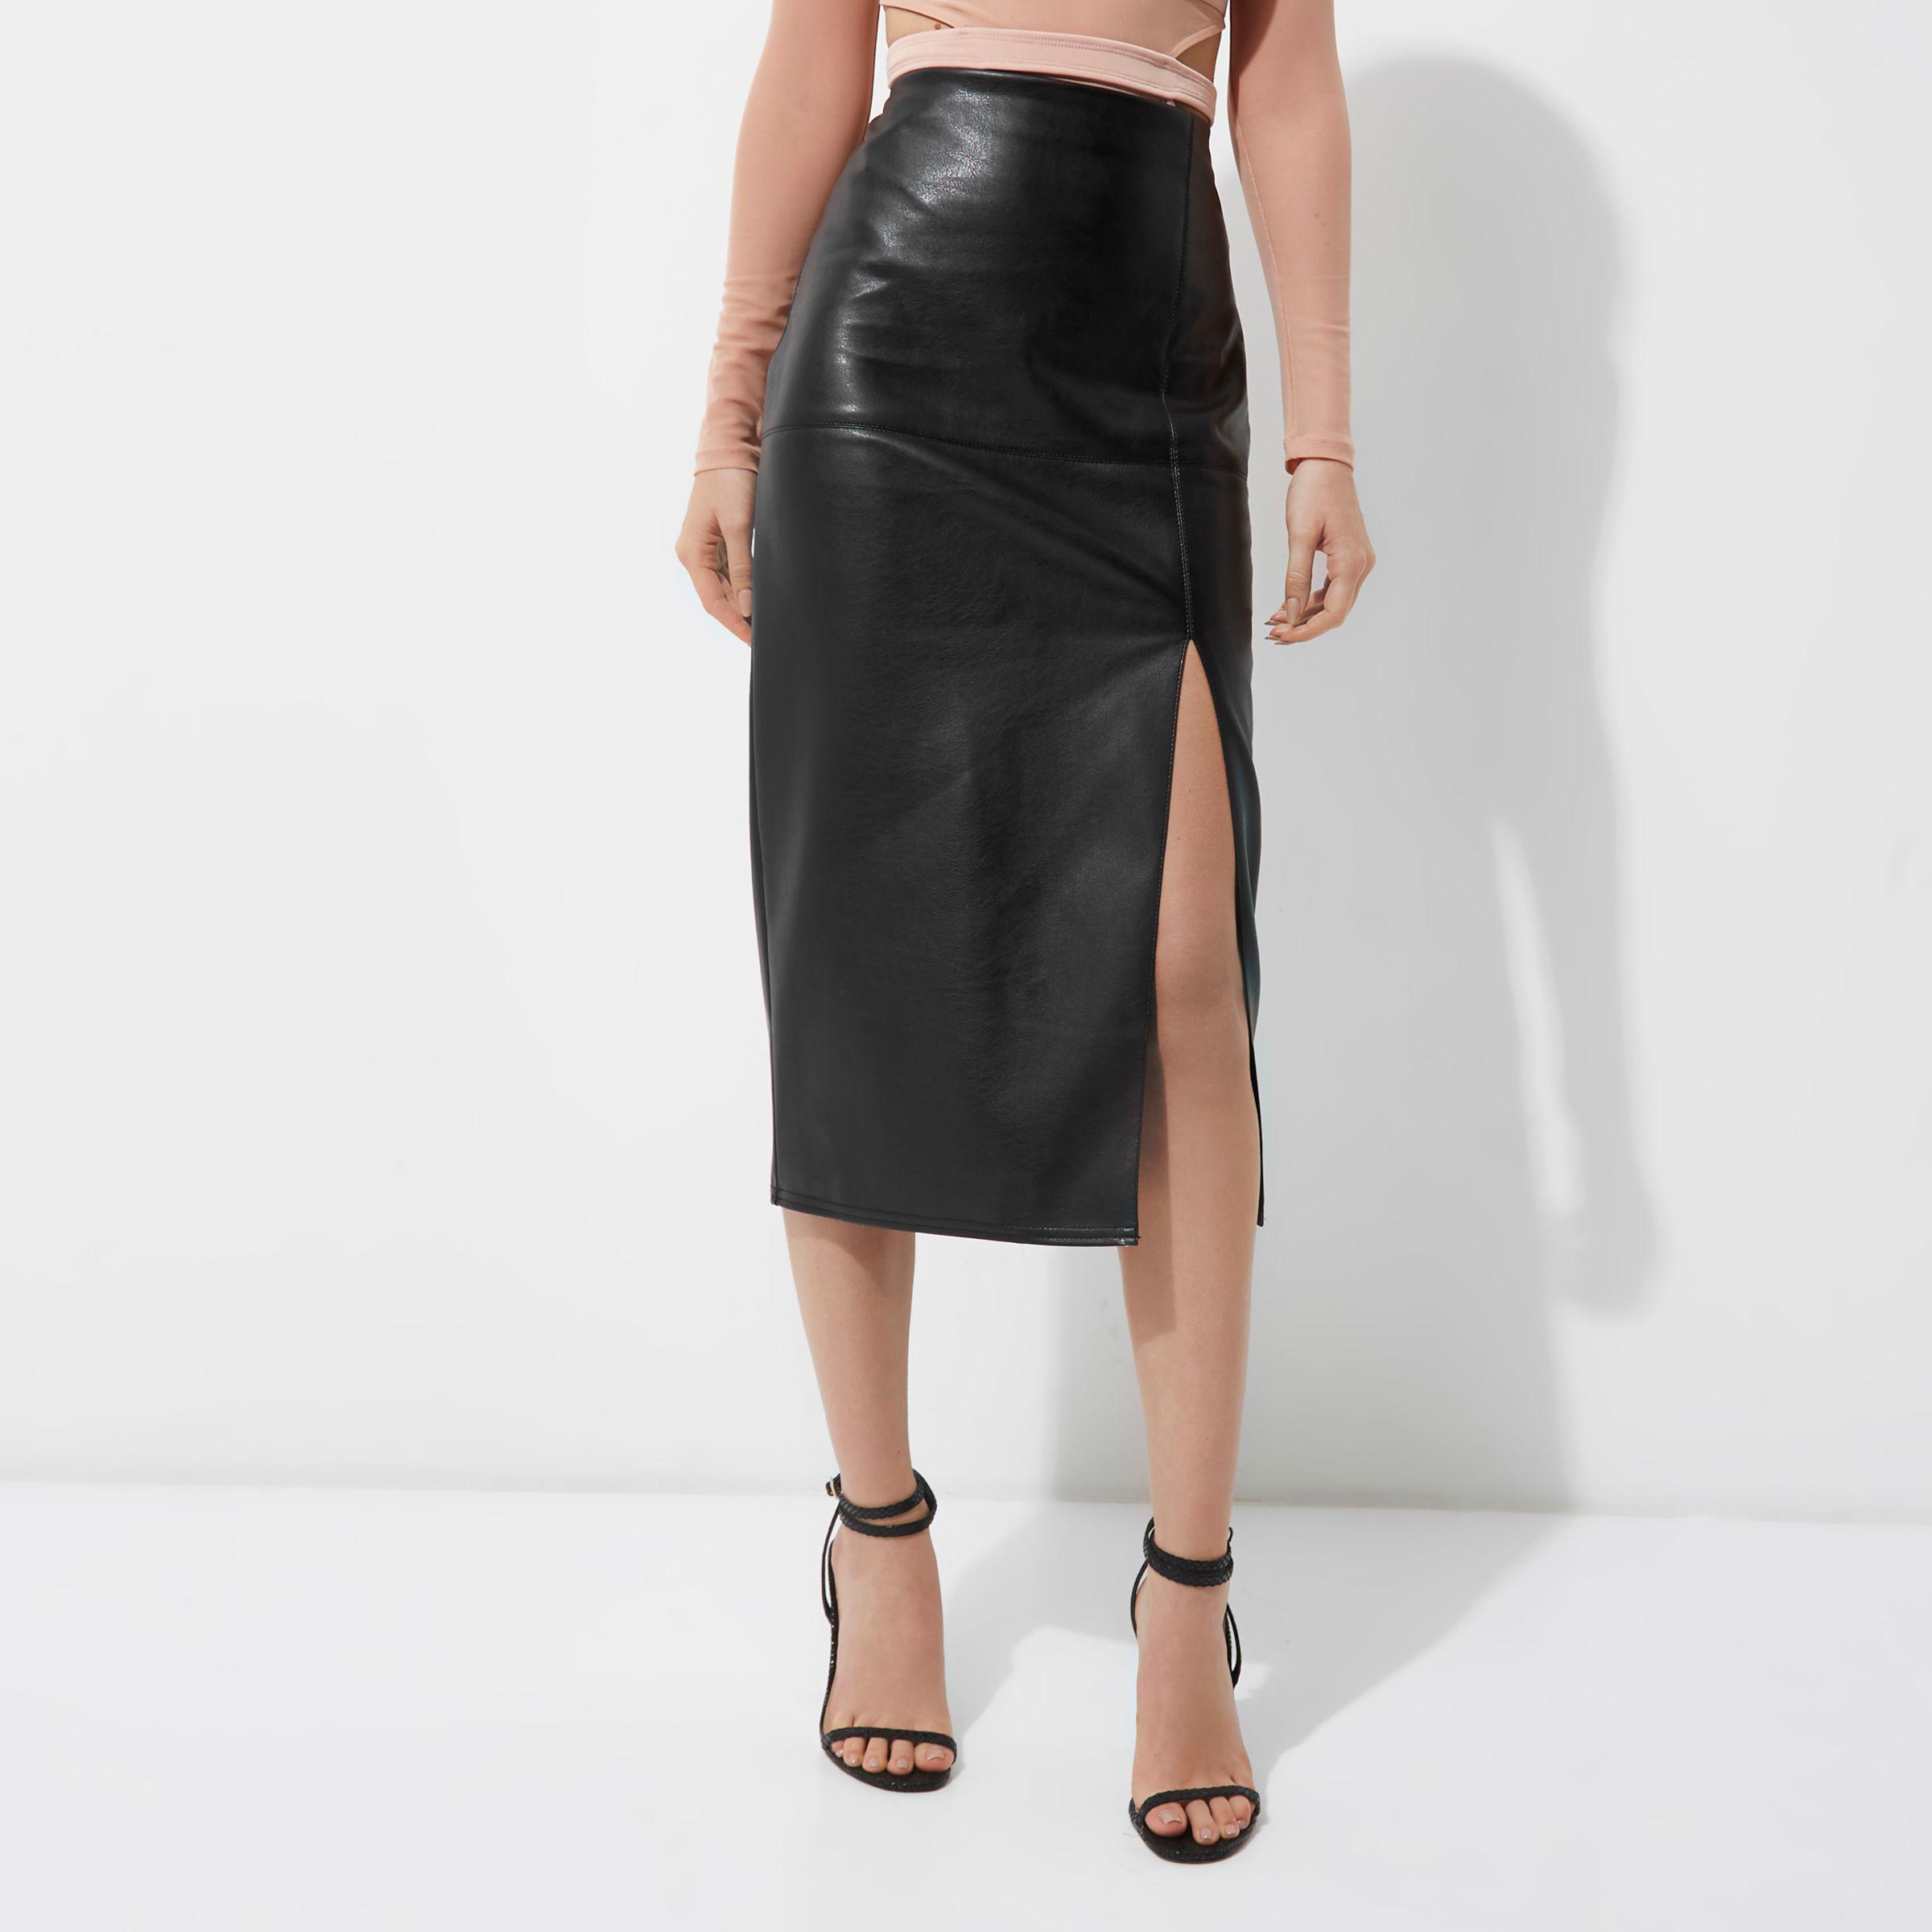 26c5e7e092 River Island Black Faux Leather Side Split Pencil Skirt in Black - Lyst